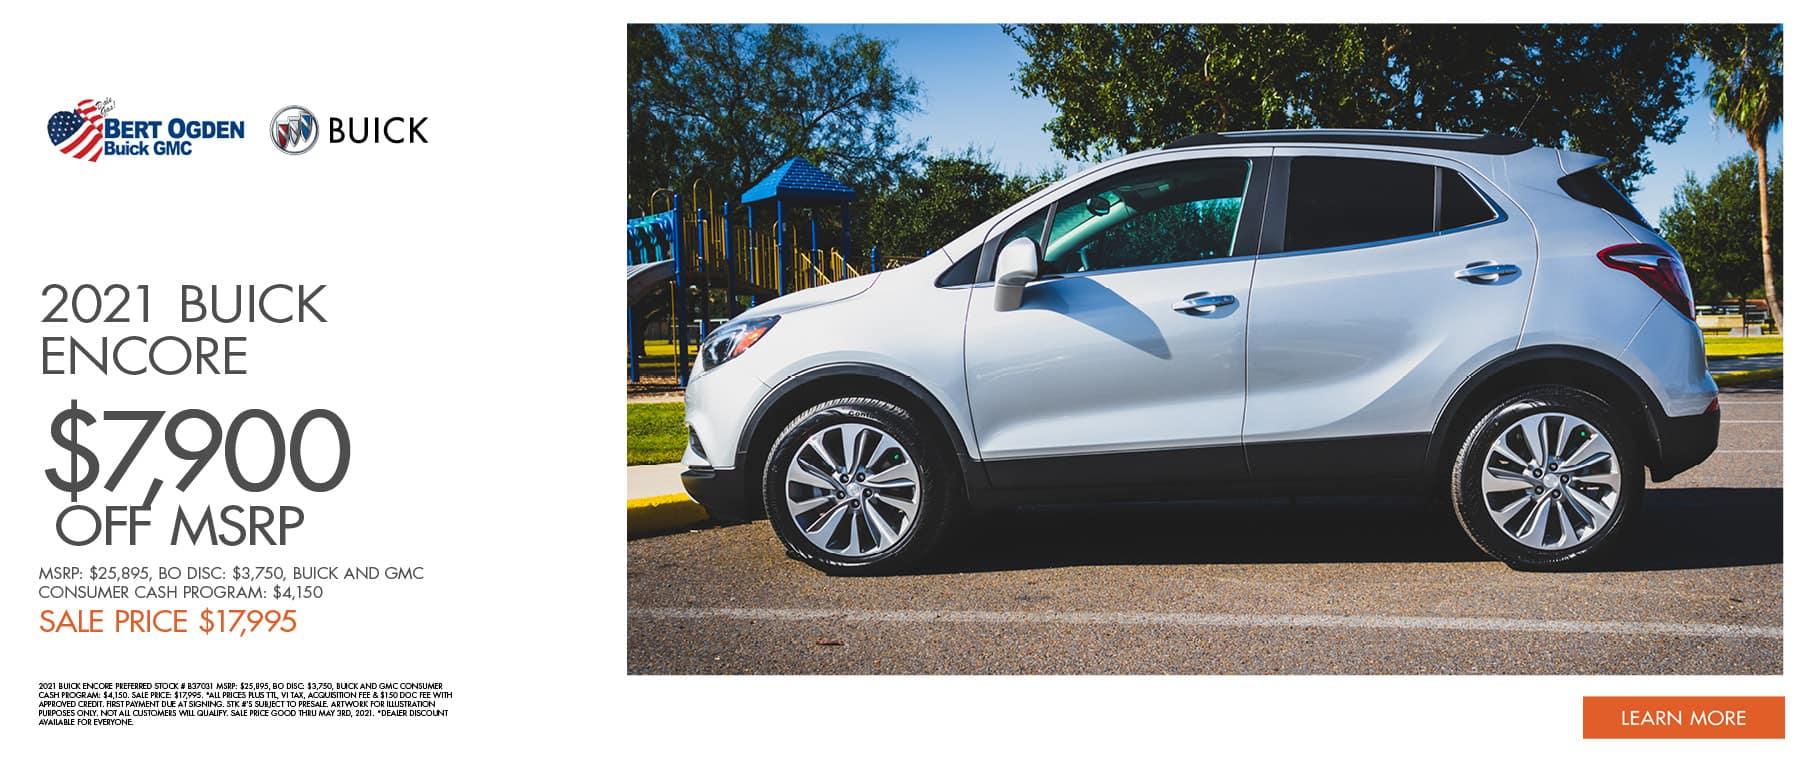 2021 Buick Encore | Bert Ogden Buick GMC | Edinburg, TX